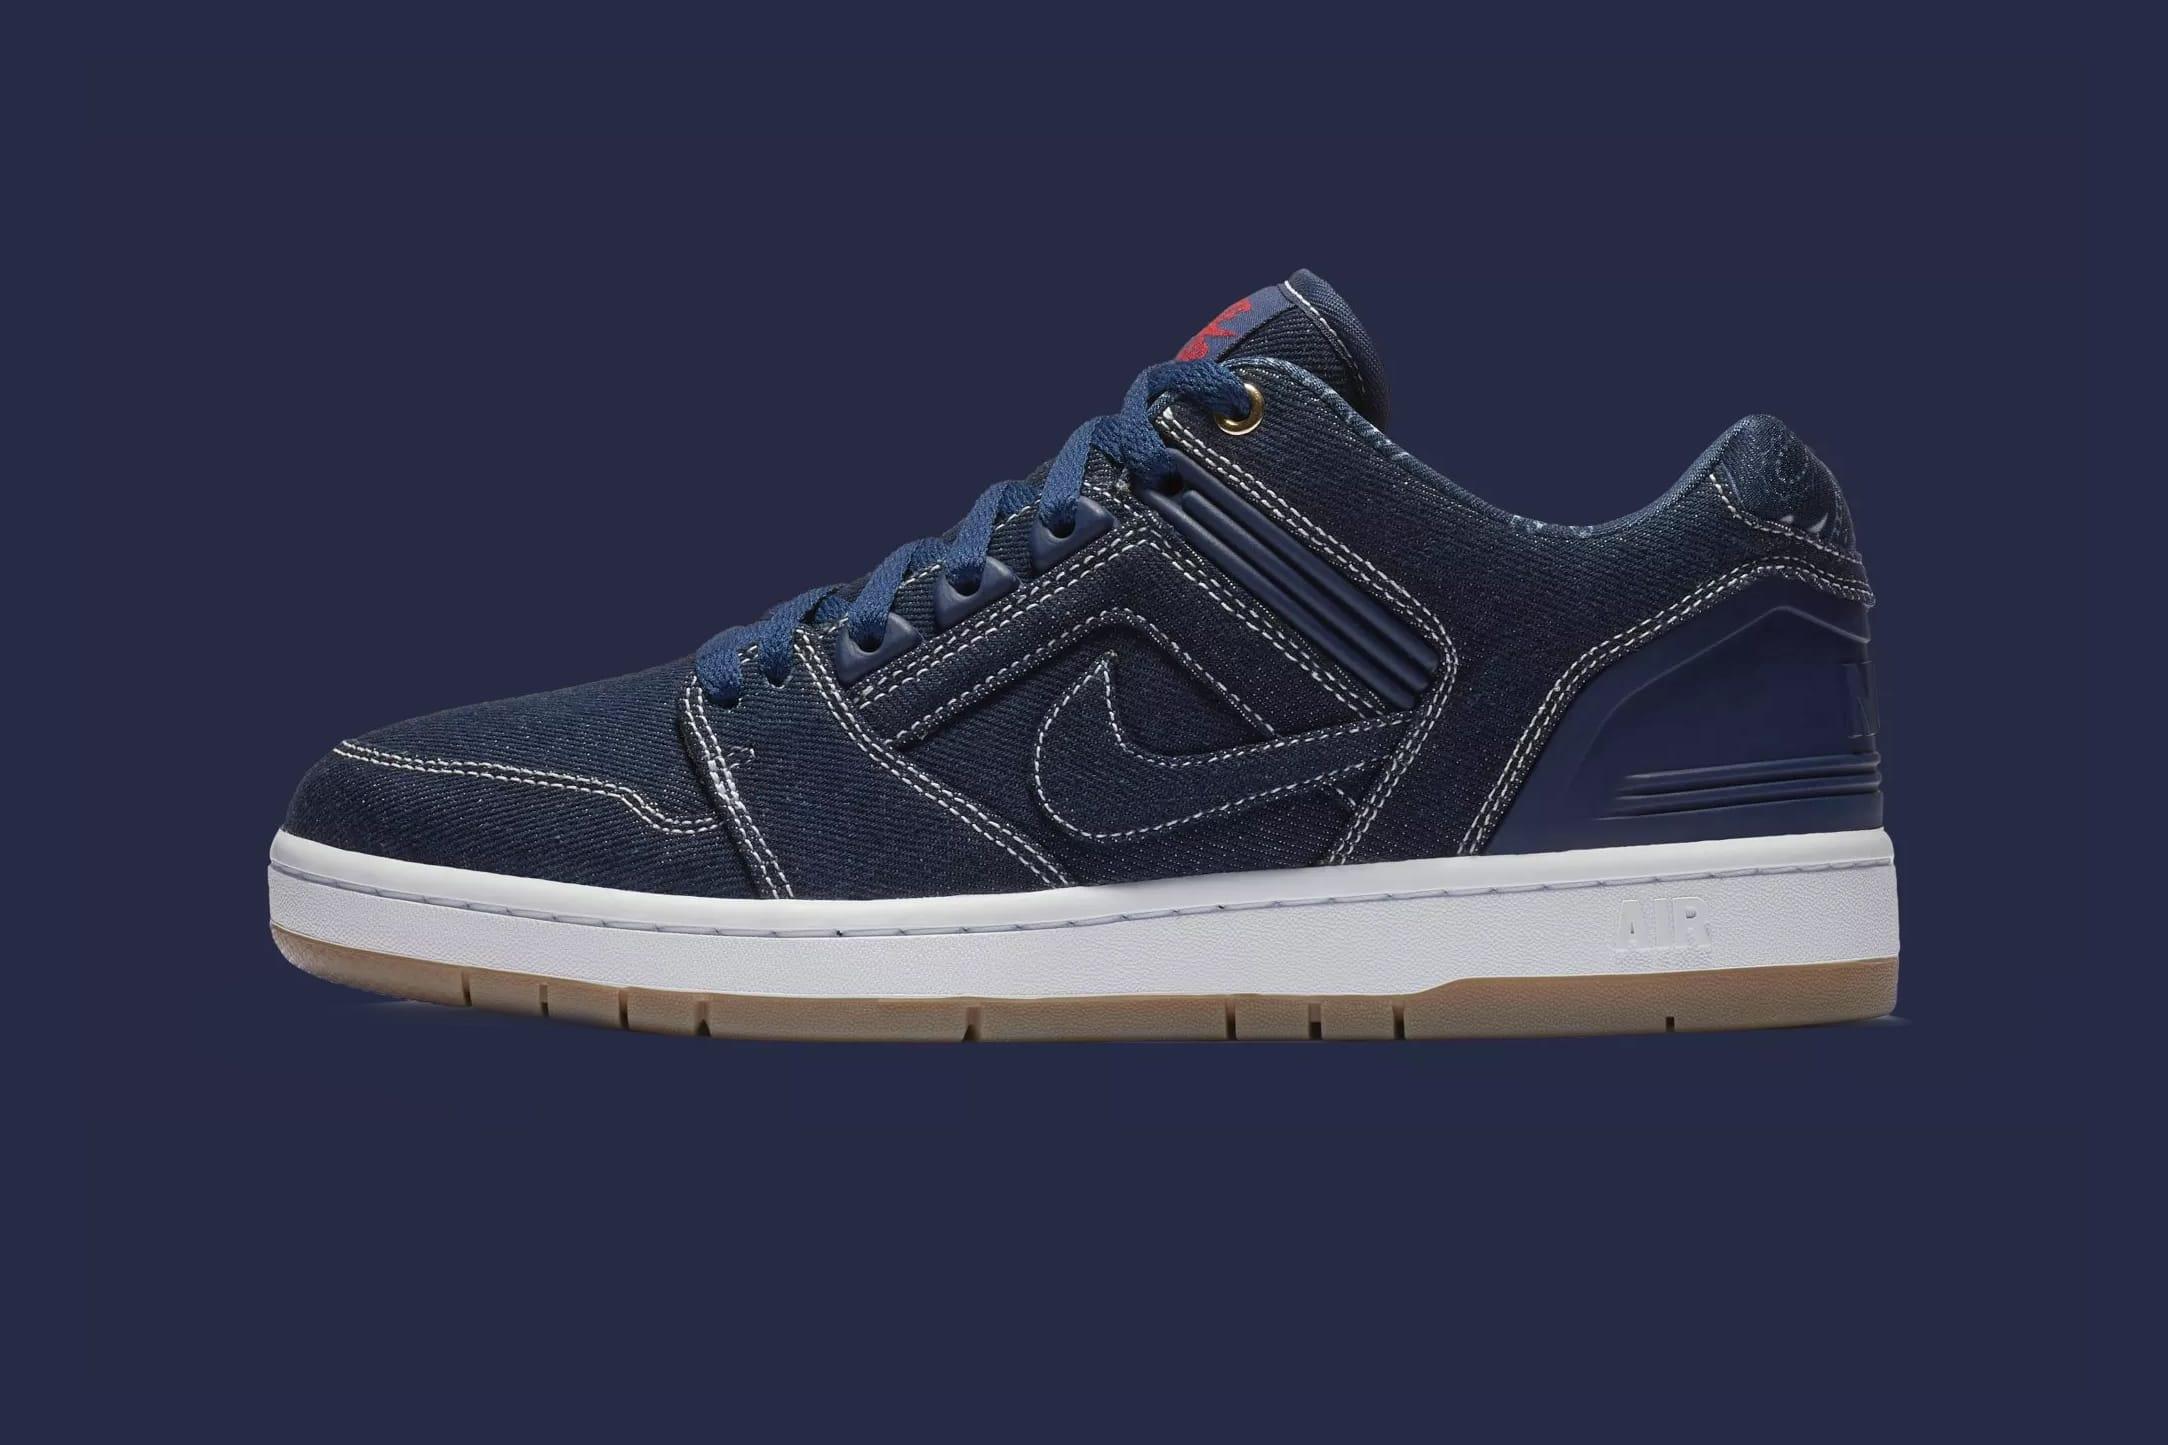 online retailer 06d8a d5755 nike sb eric koston 2 azul blue shoes